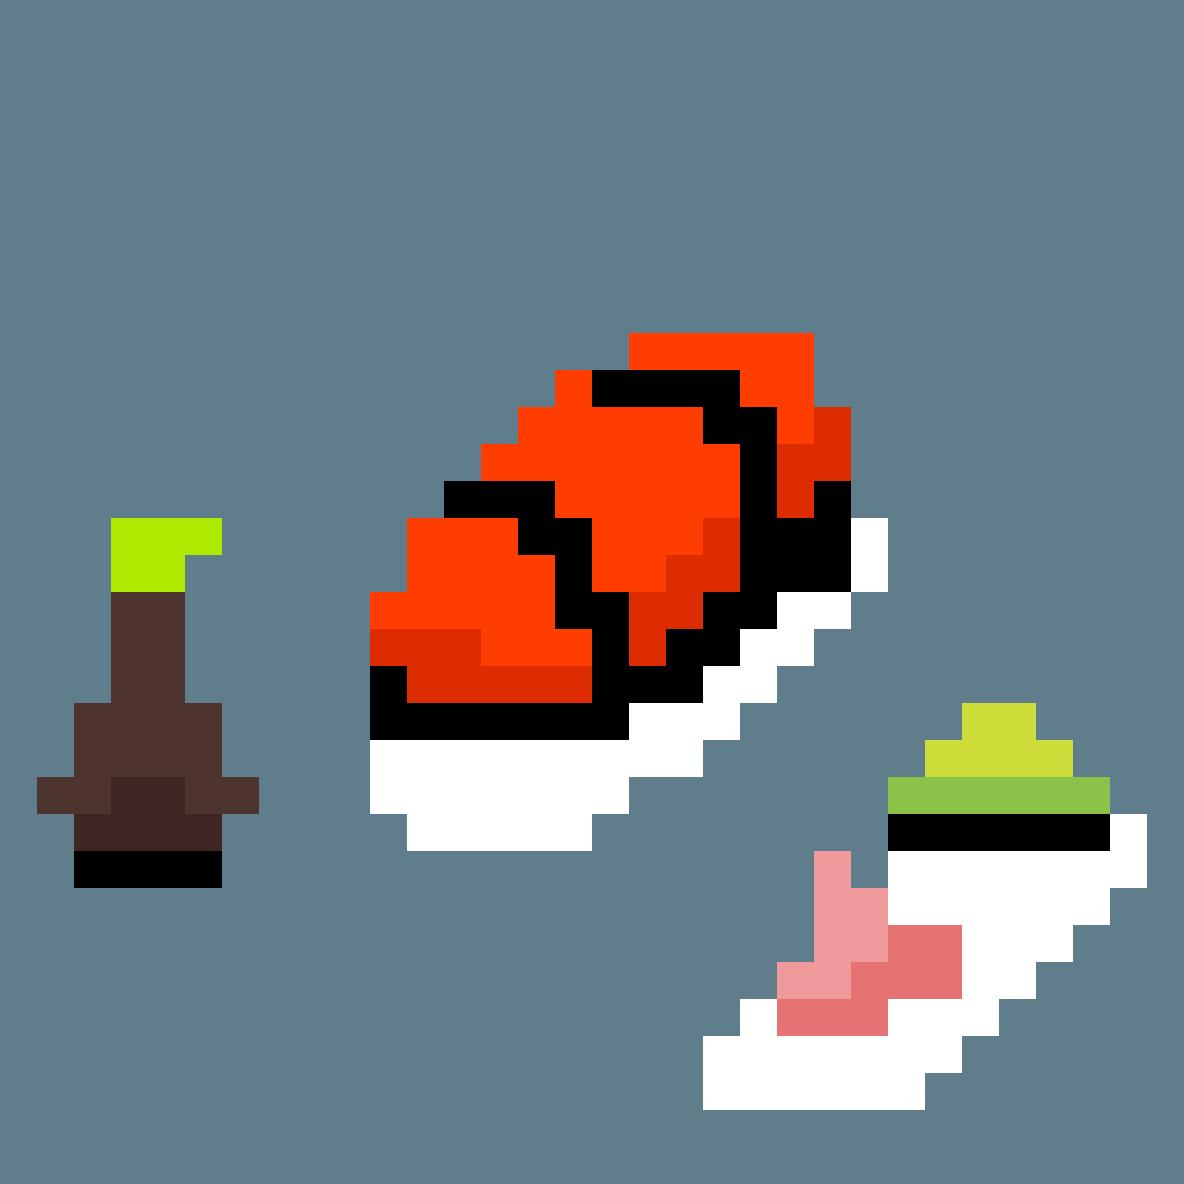 Fish on rice by animatesam